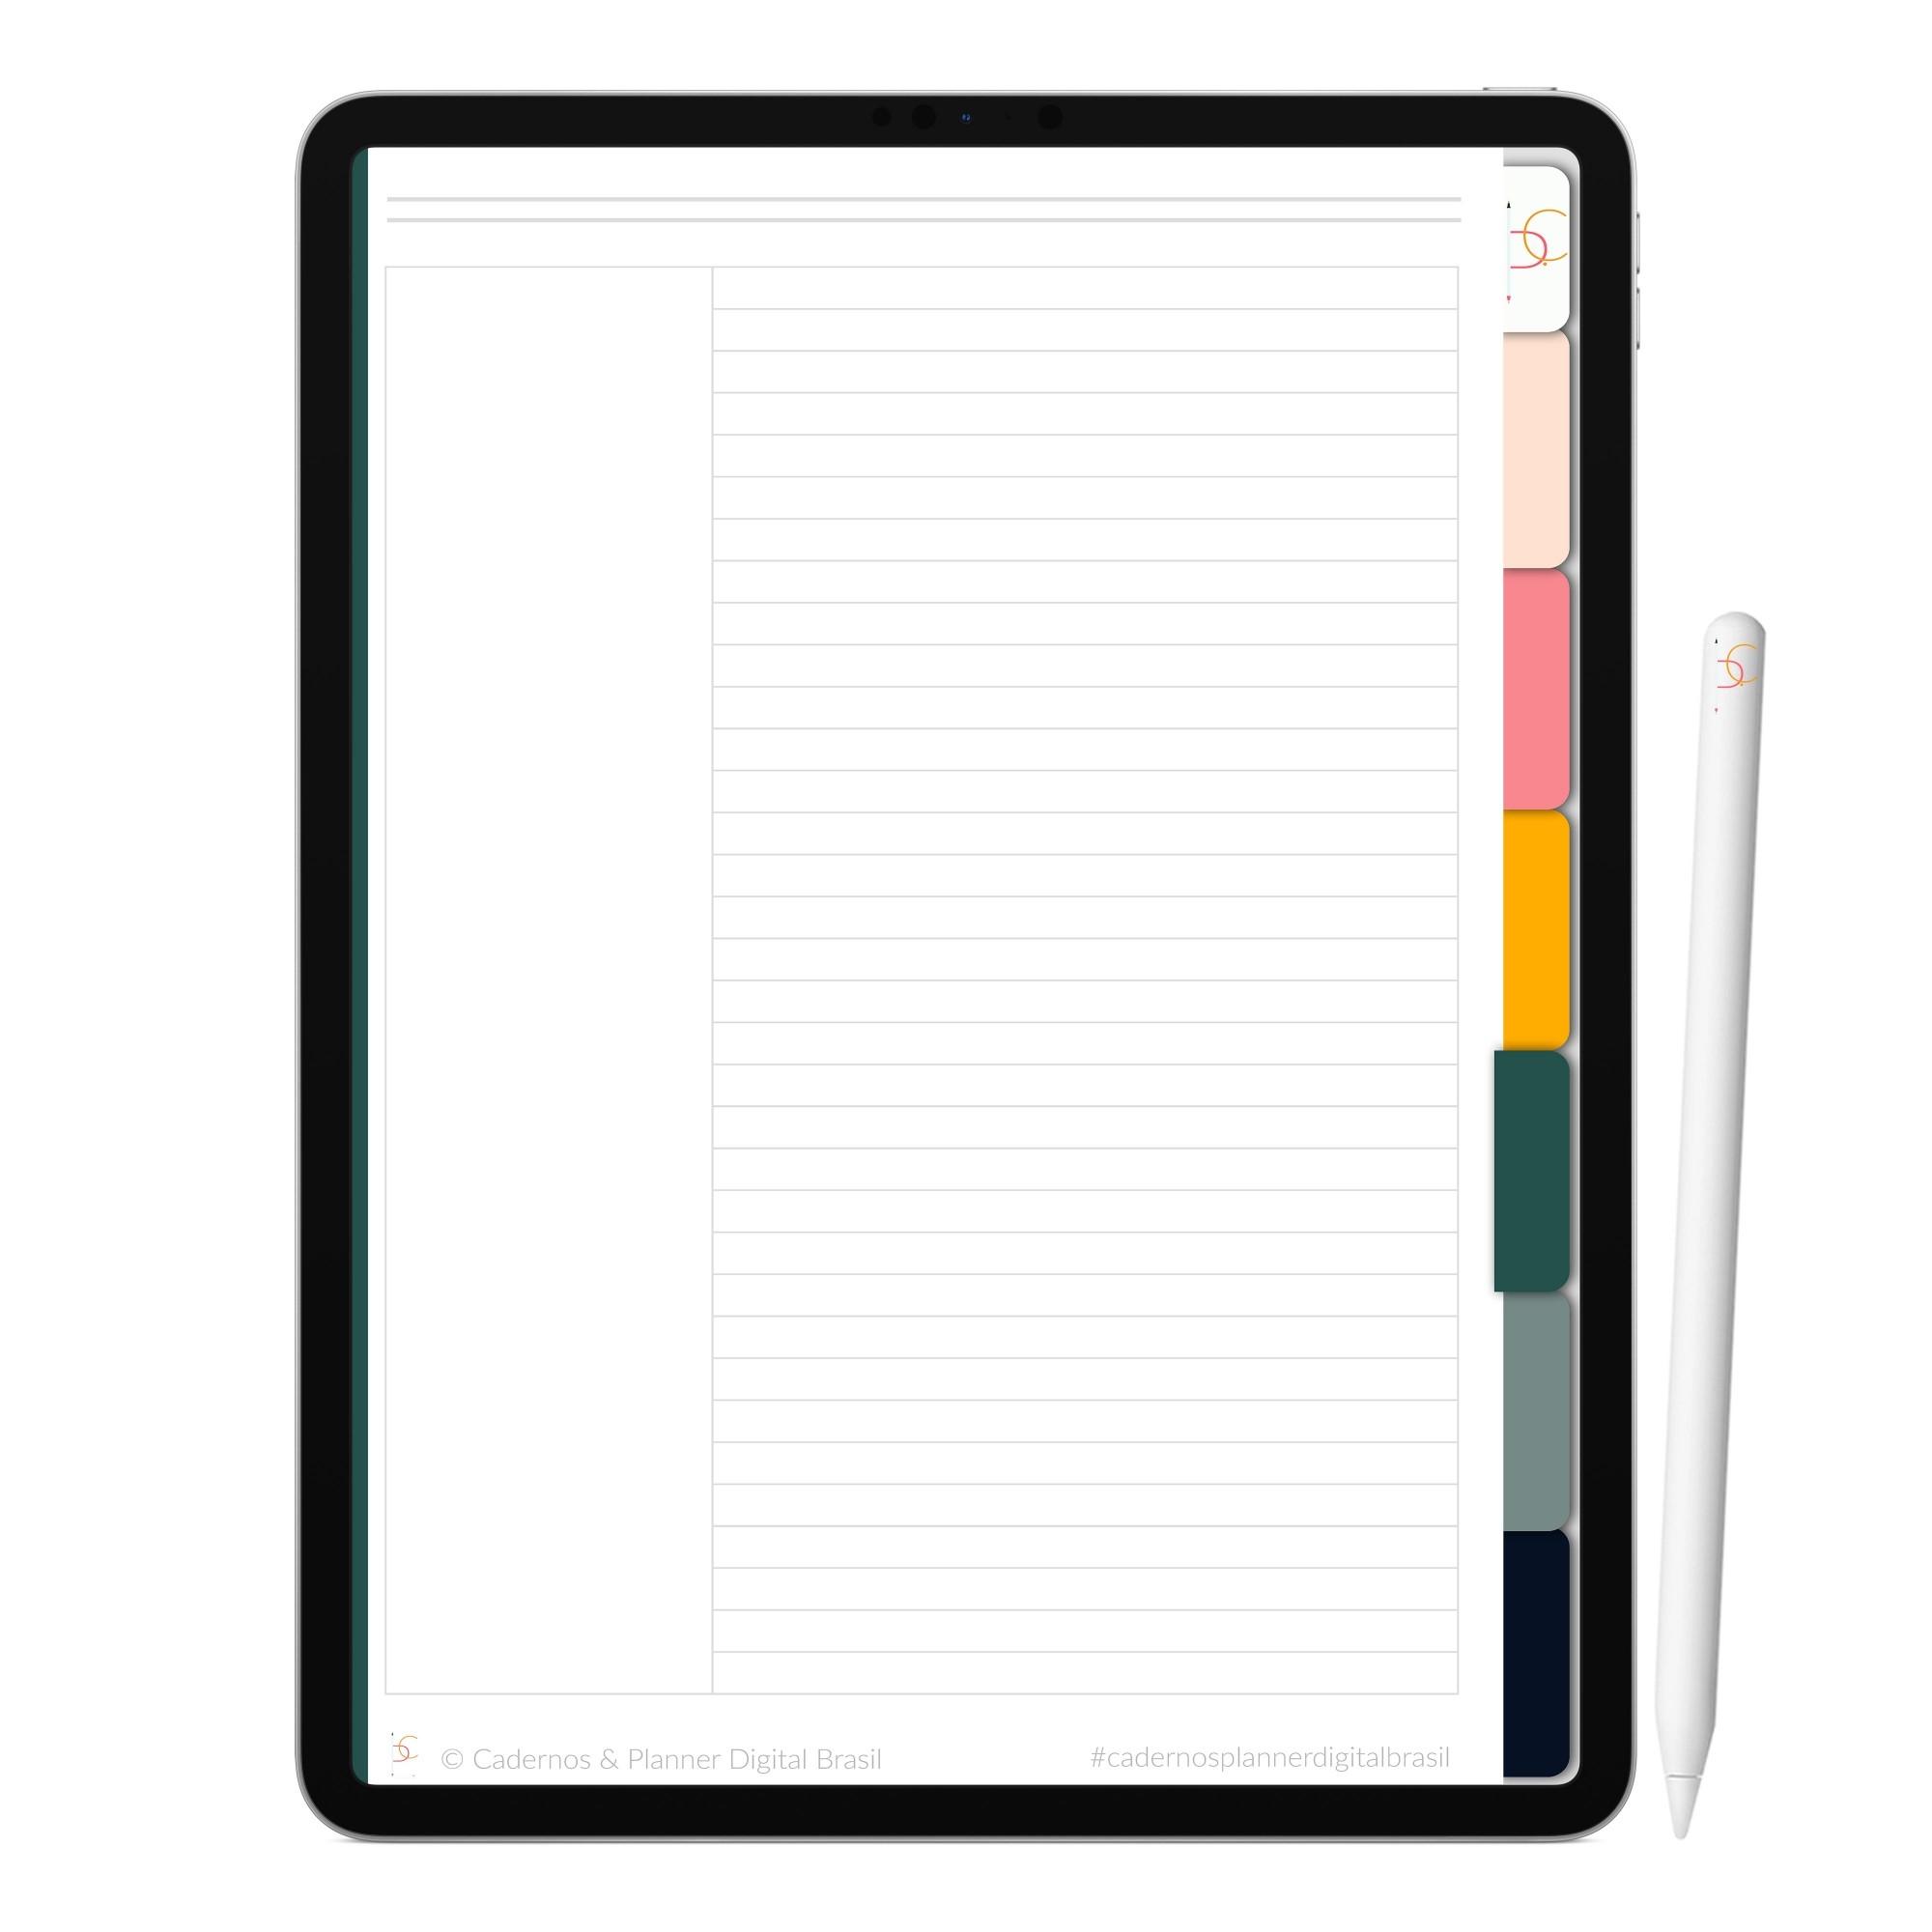 Caderno Digital Pó Estrelar | Seis Divisórias Interativo| iPad Tablet | Download Instantâneo